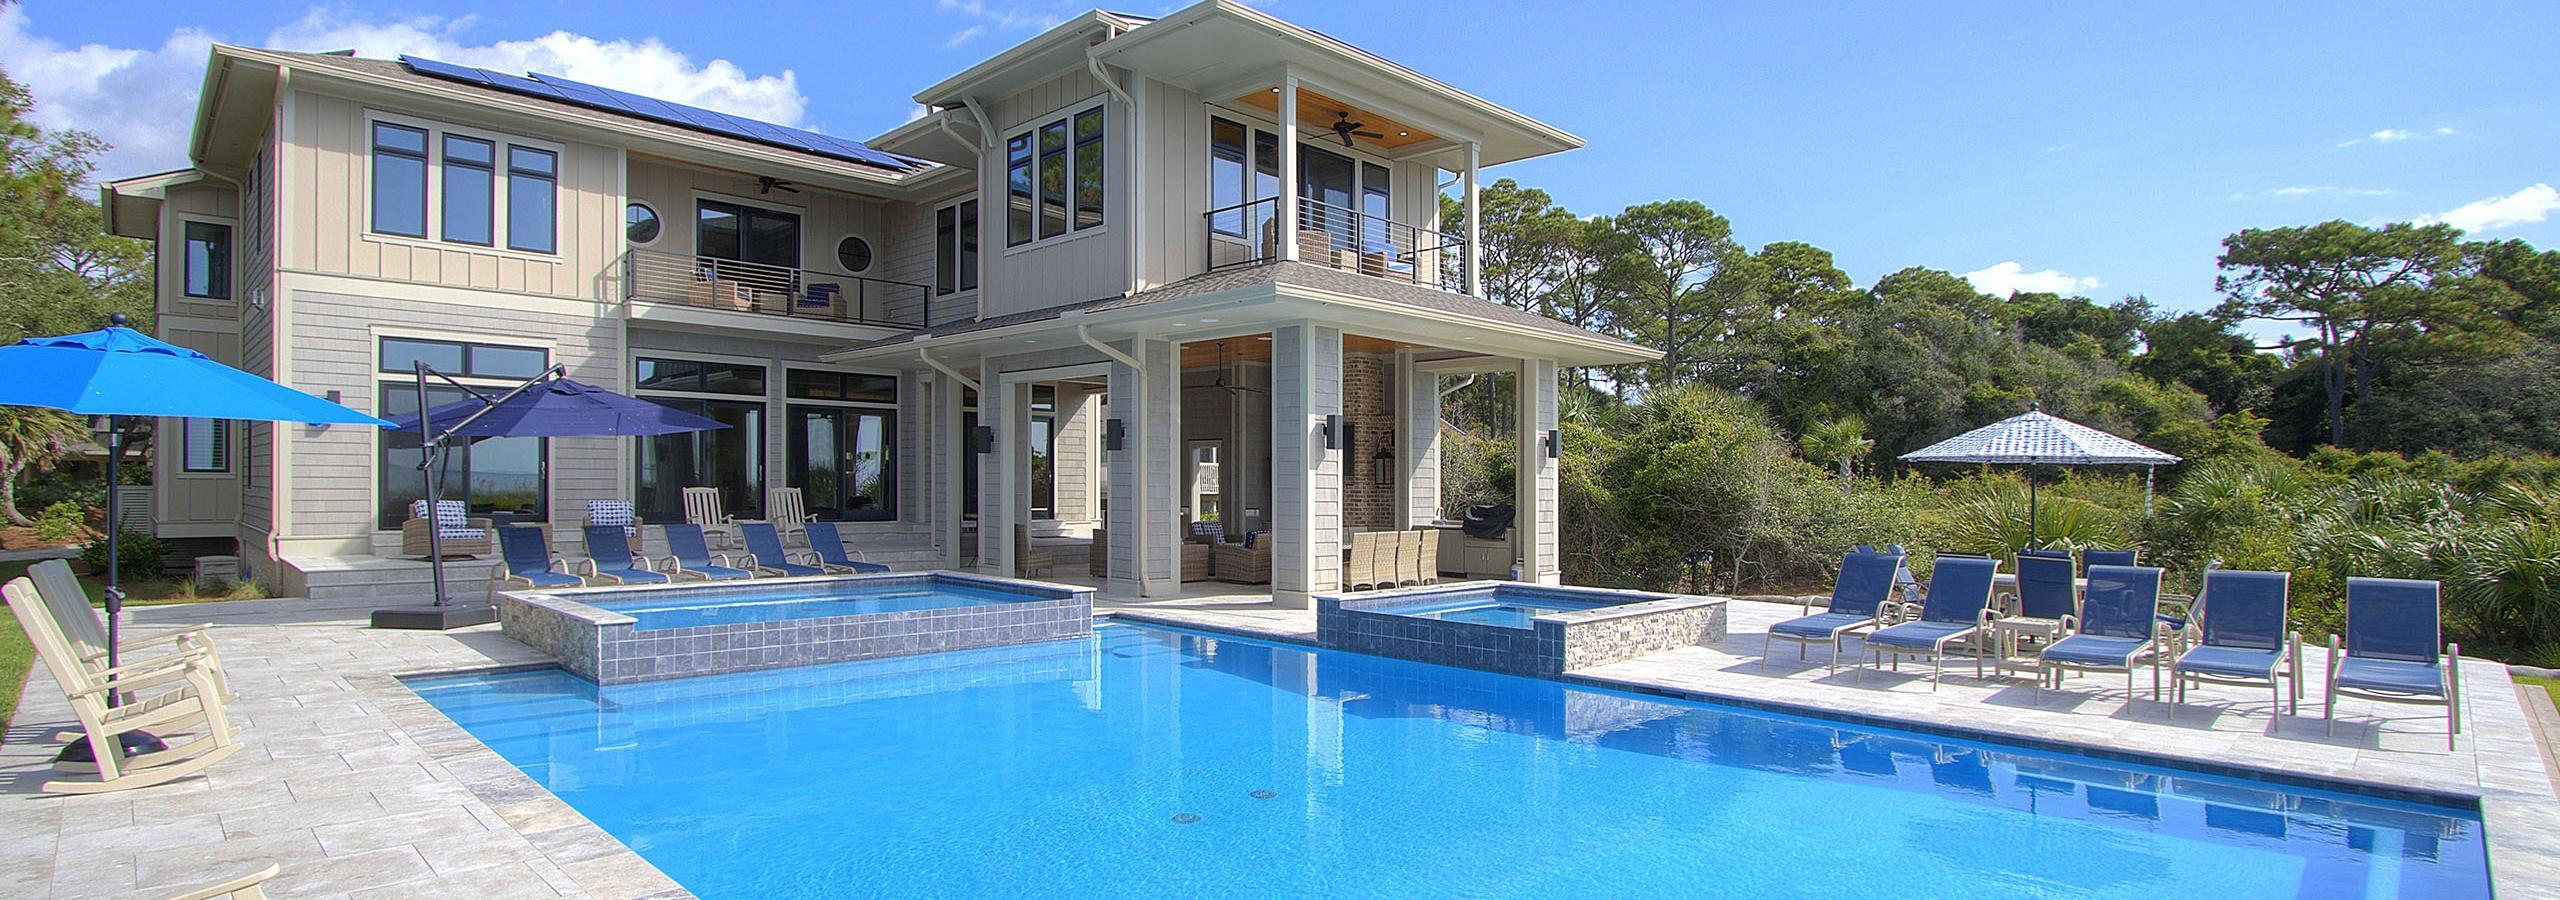 Destination Vacation Hilton Head Island Hilton Head Vacation Rentals